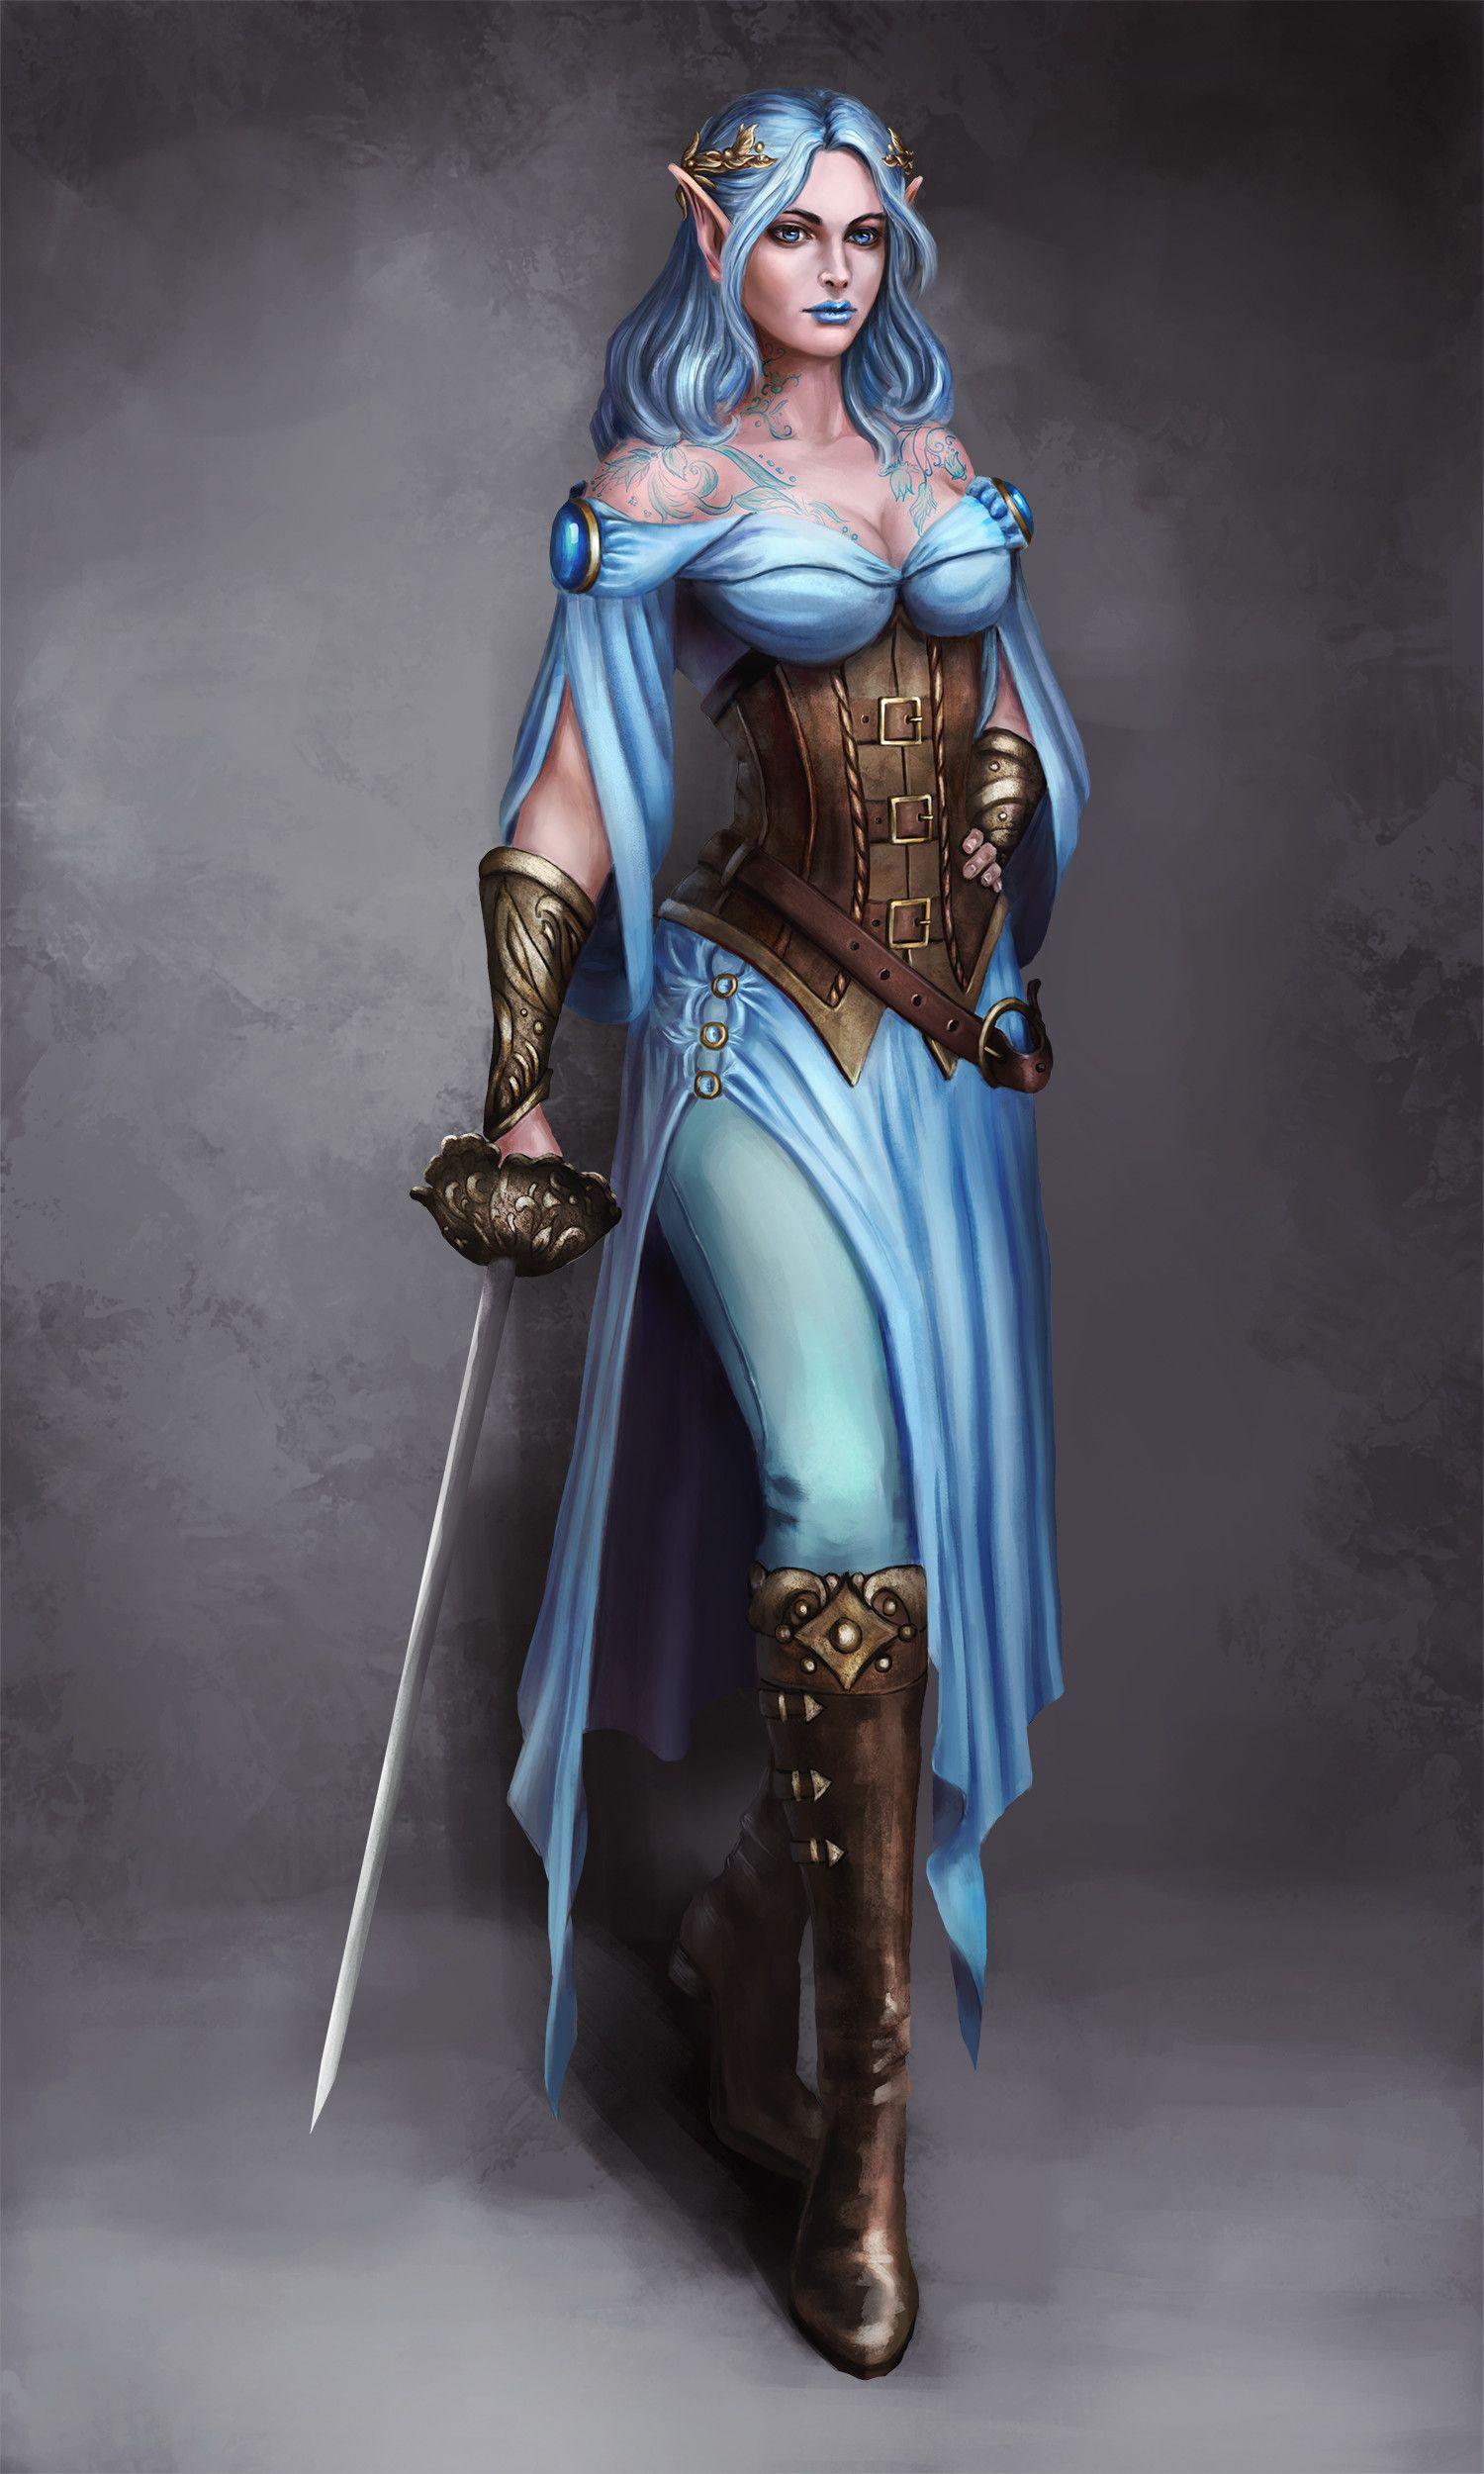 ArtStation - Female Elf Warrior, Kceon Nika   chick s of ...